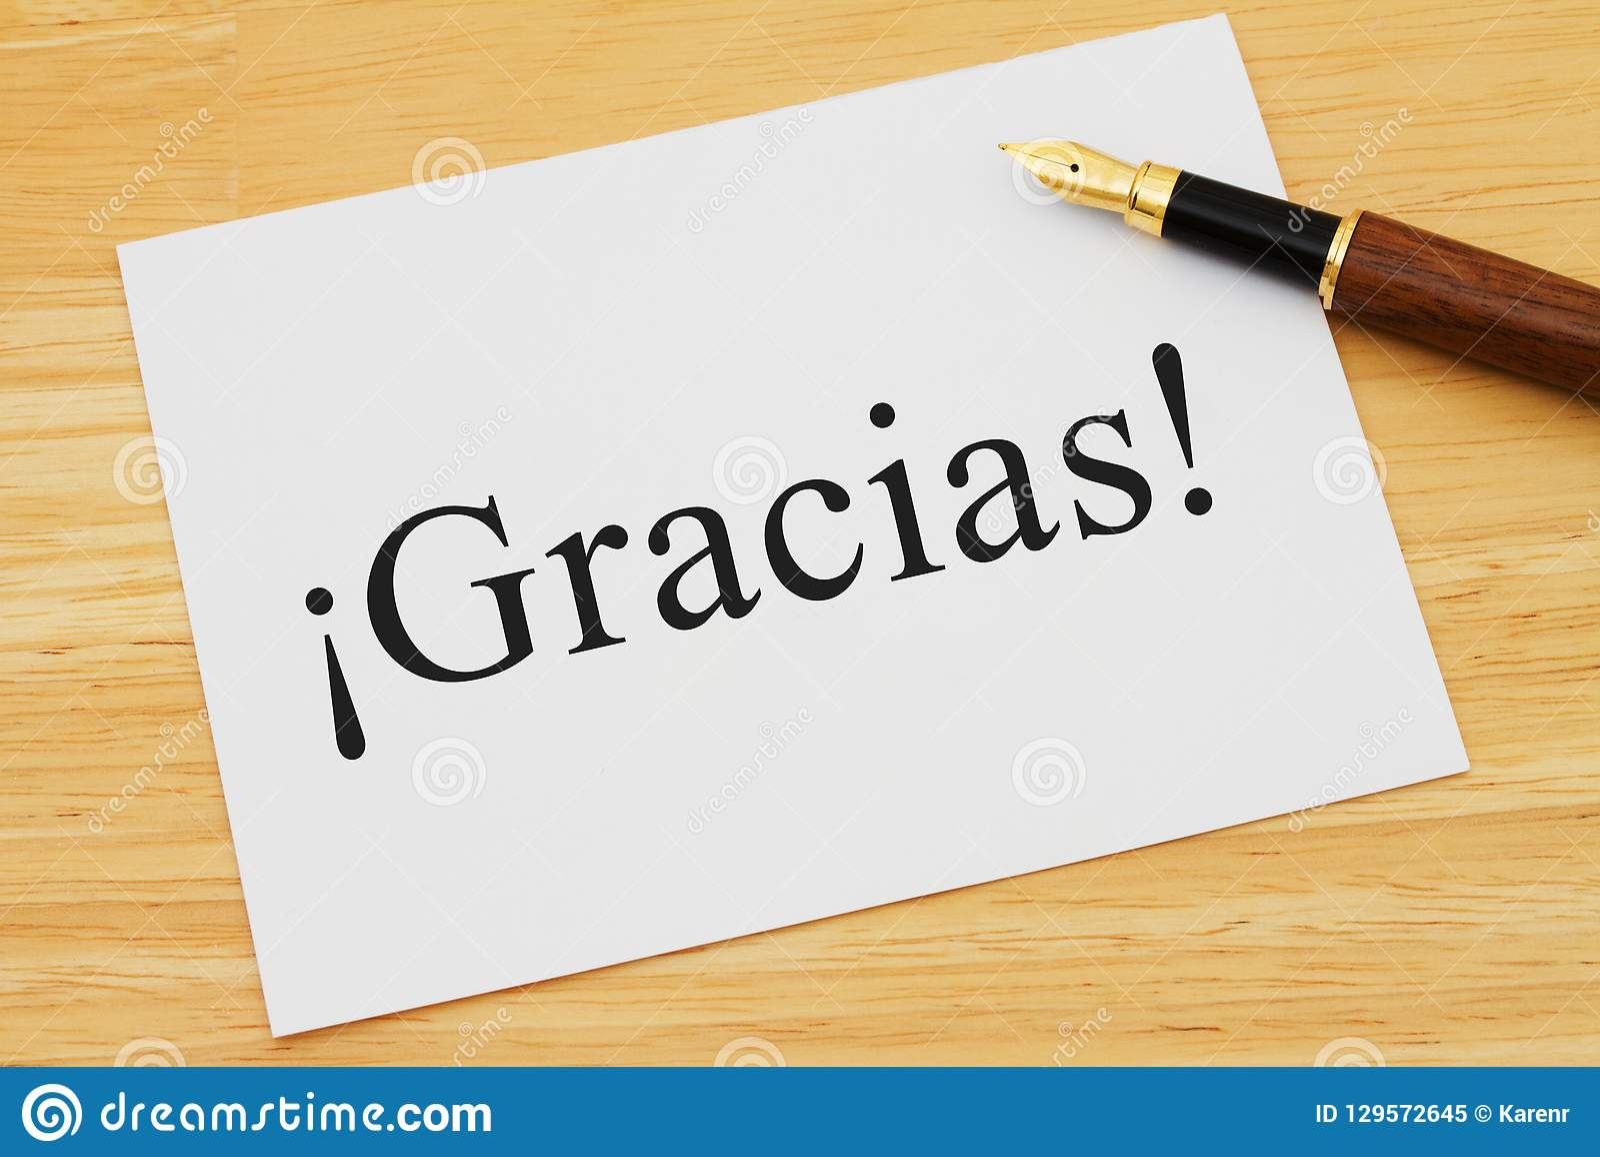 Spanish Thank You Message On Desk Stock Image - Image of spanish